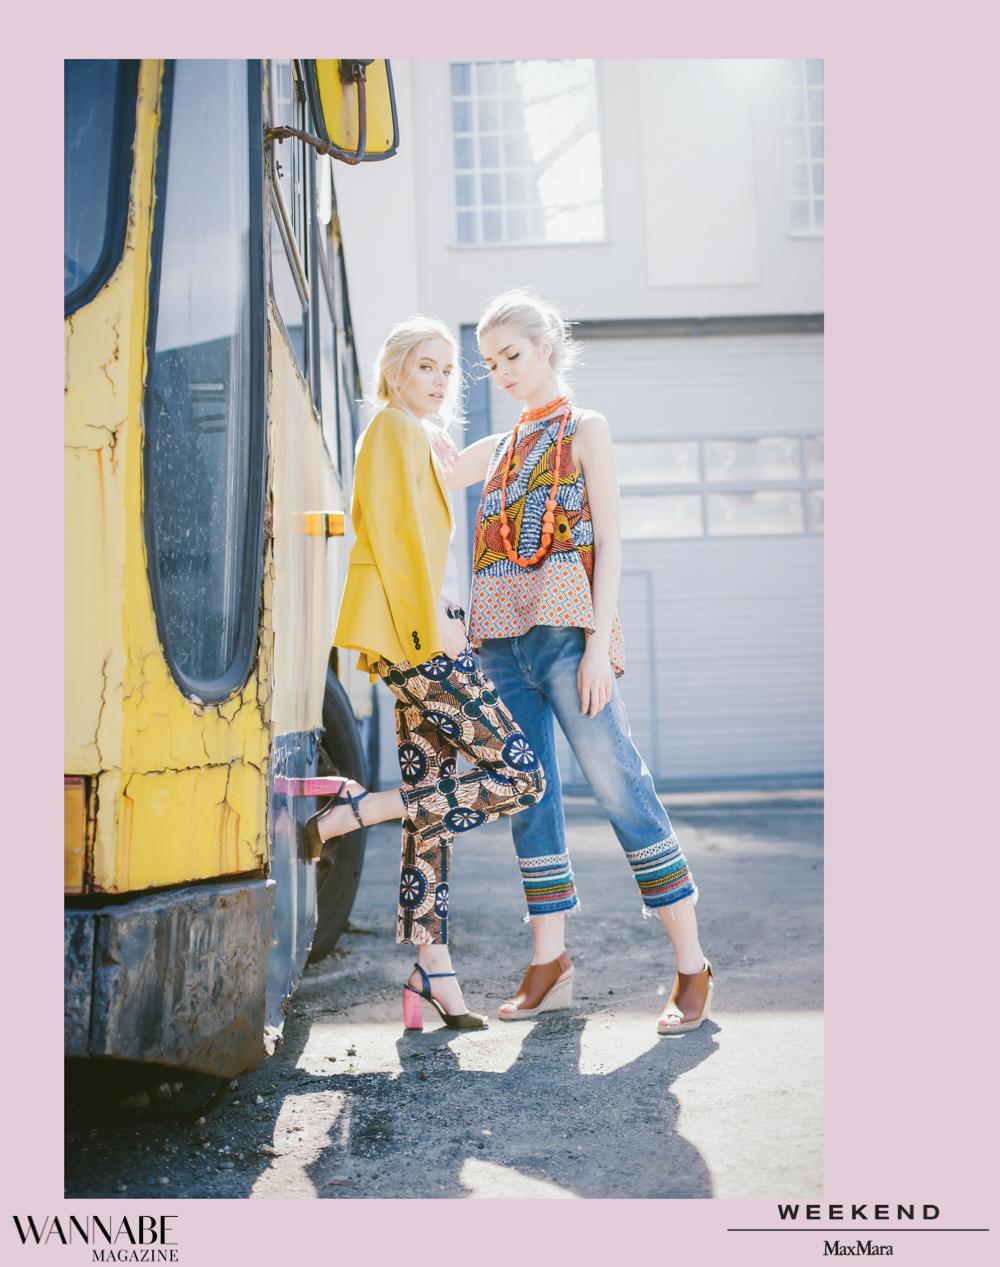 max and co sajt 4 Wannabe editorijal: Shapes Of Fashion